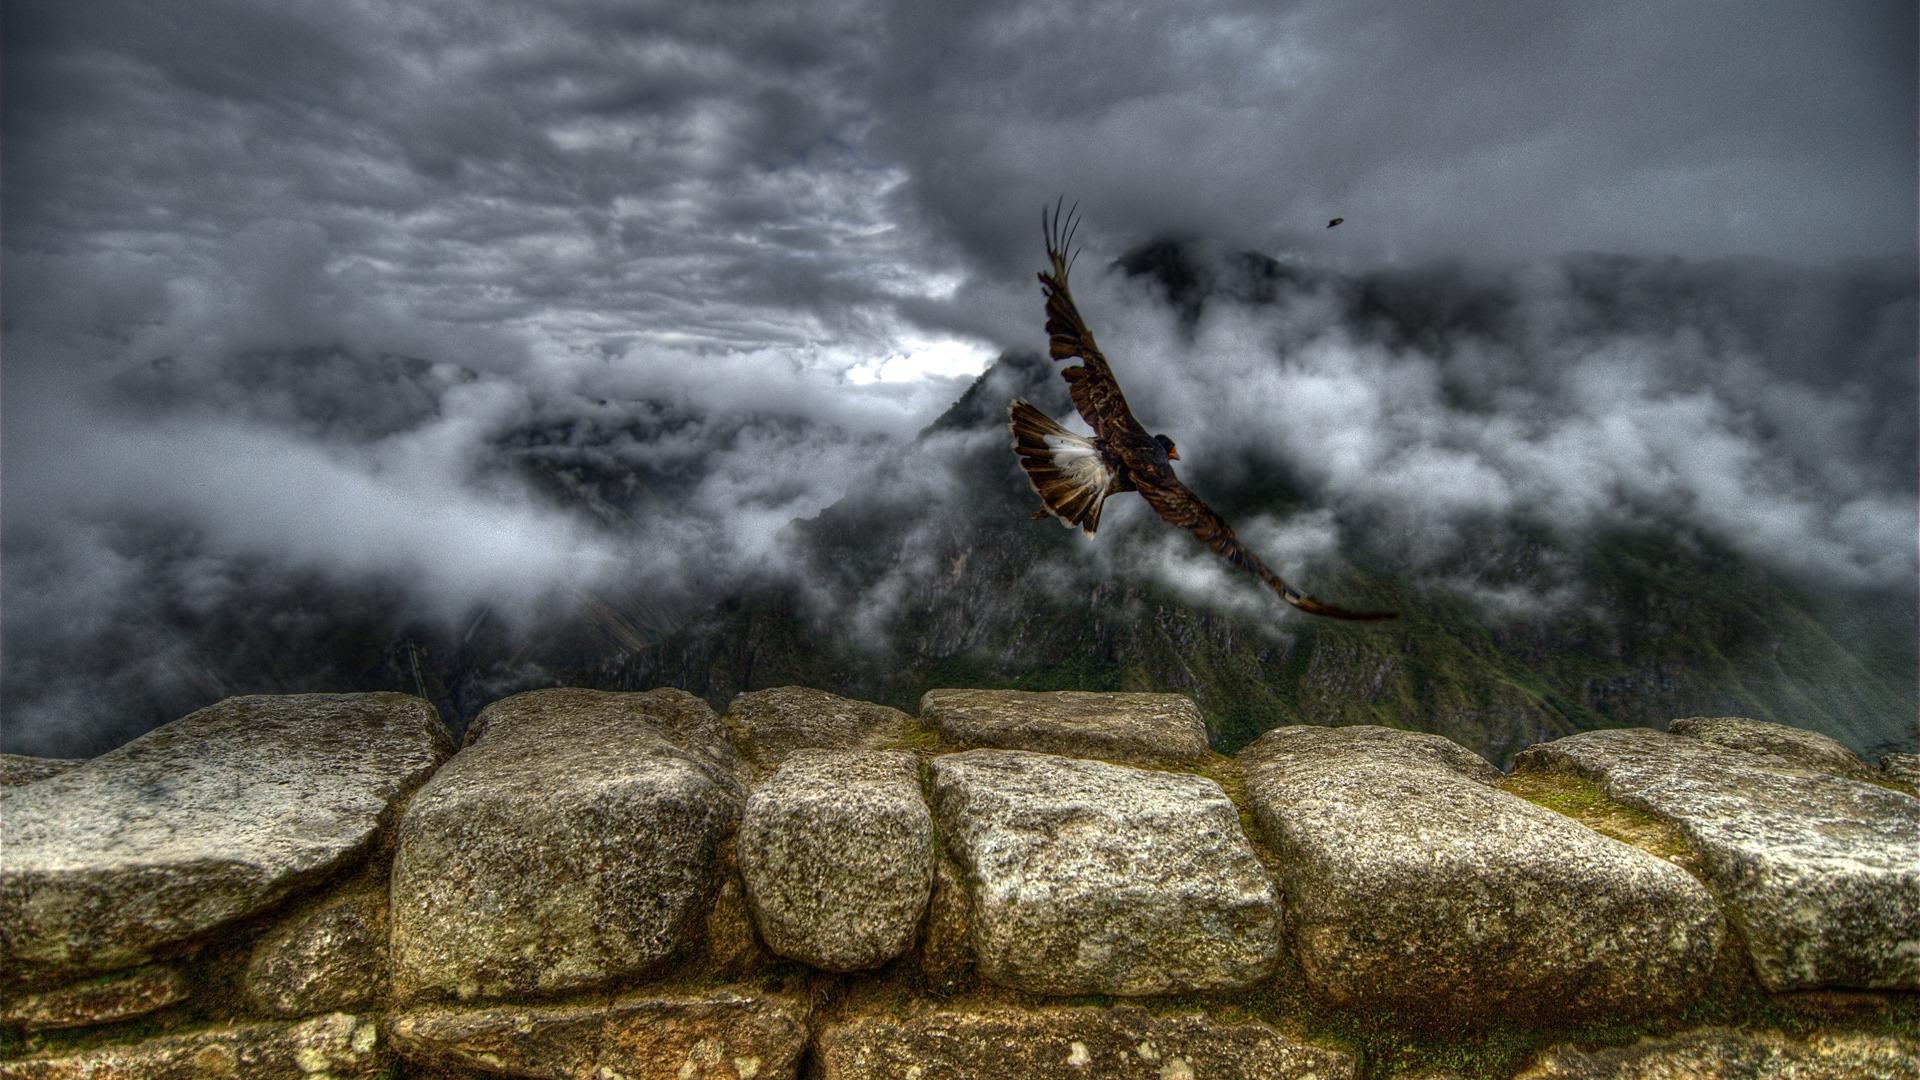 Landscape Mountains Birds Animals Rock Nature Stones Wall Clouds South America Peru Terrain Cloud Mountain